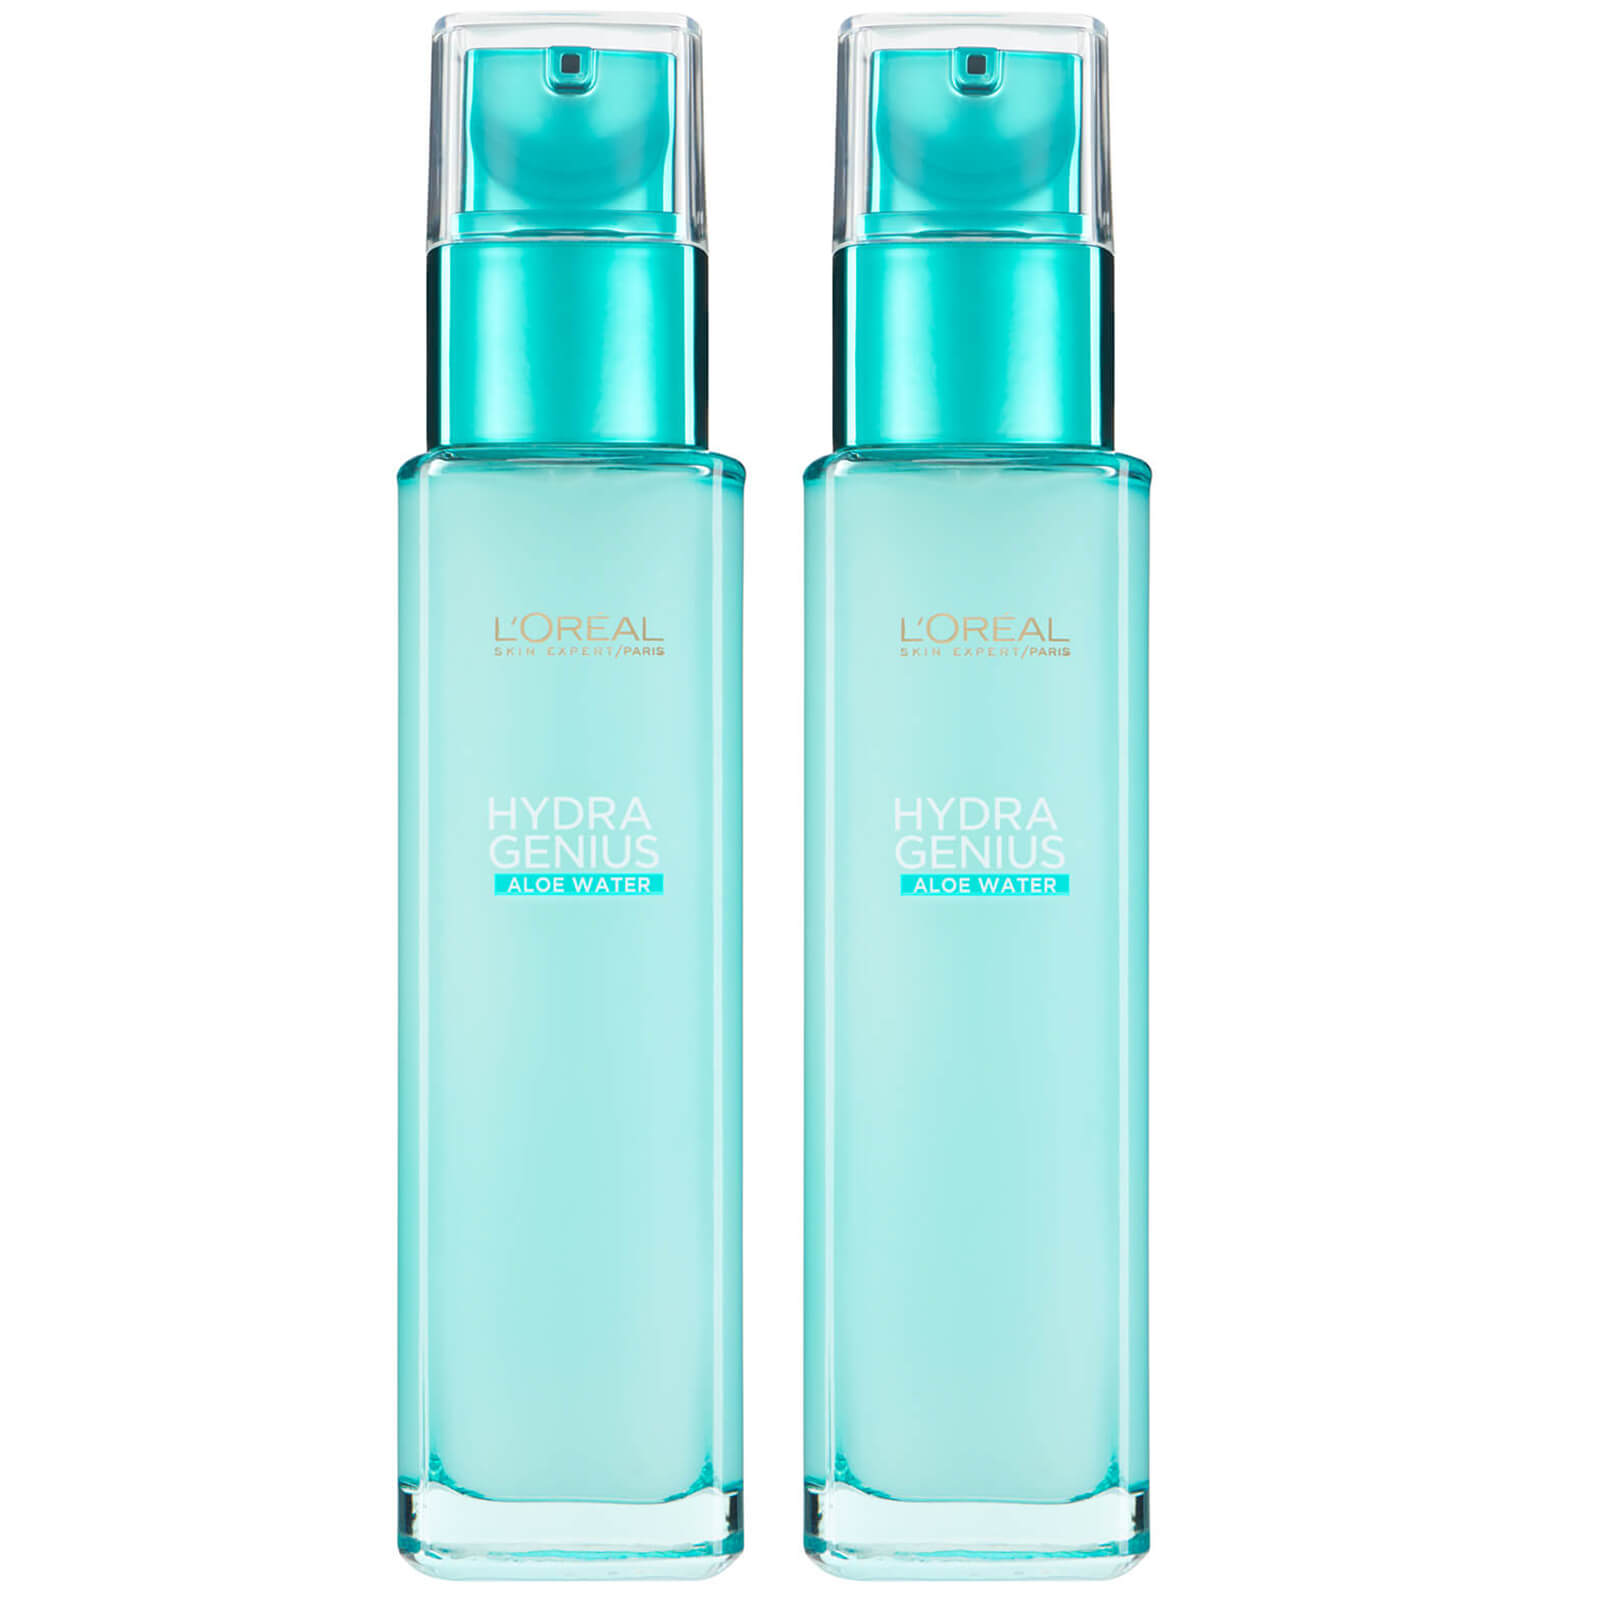 Купить L'Oréal Paris Hydra Genius Liquid Care Moisturiser for Normal Combination Skin 70ml 2 Pack Exclusive